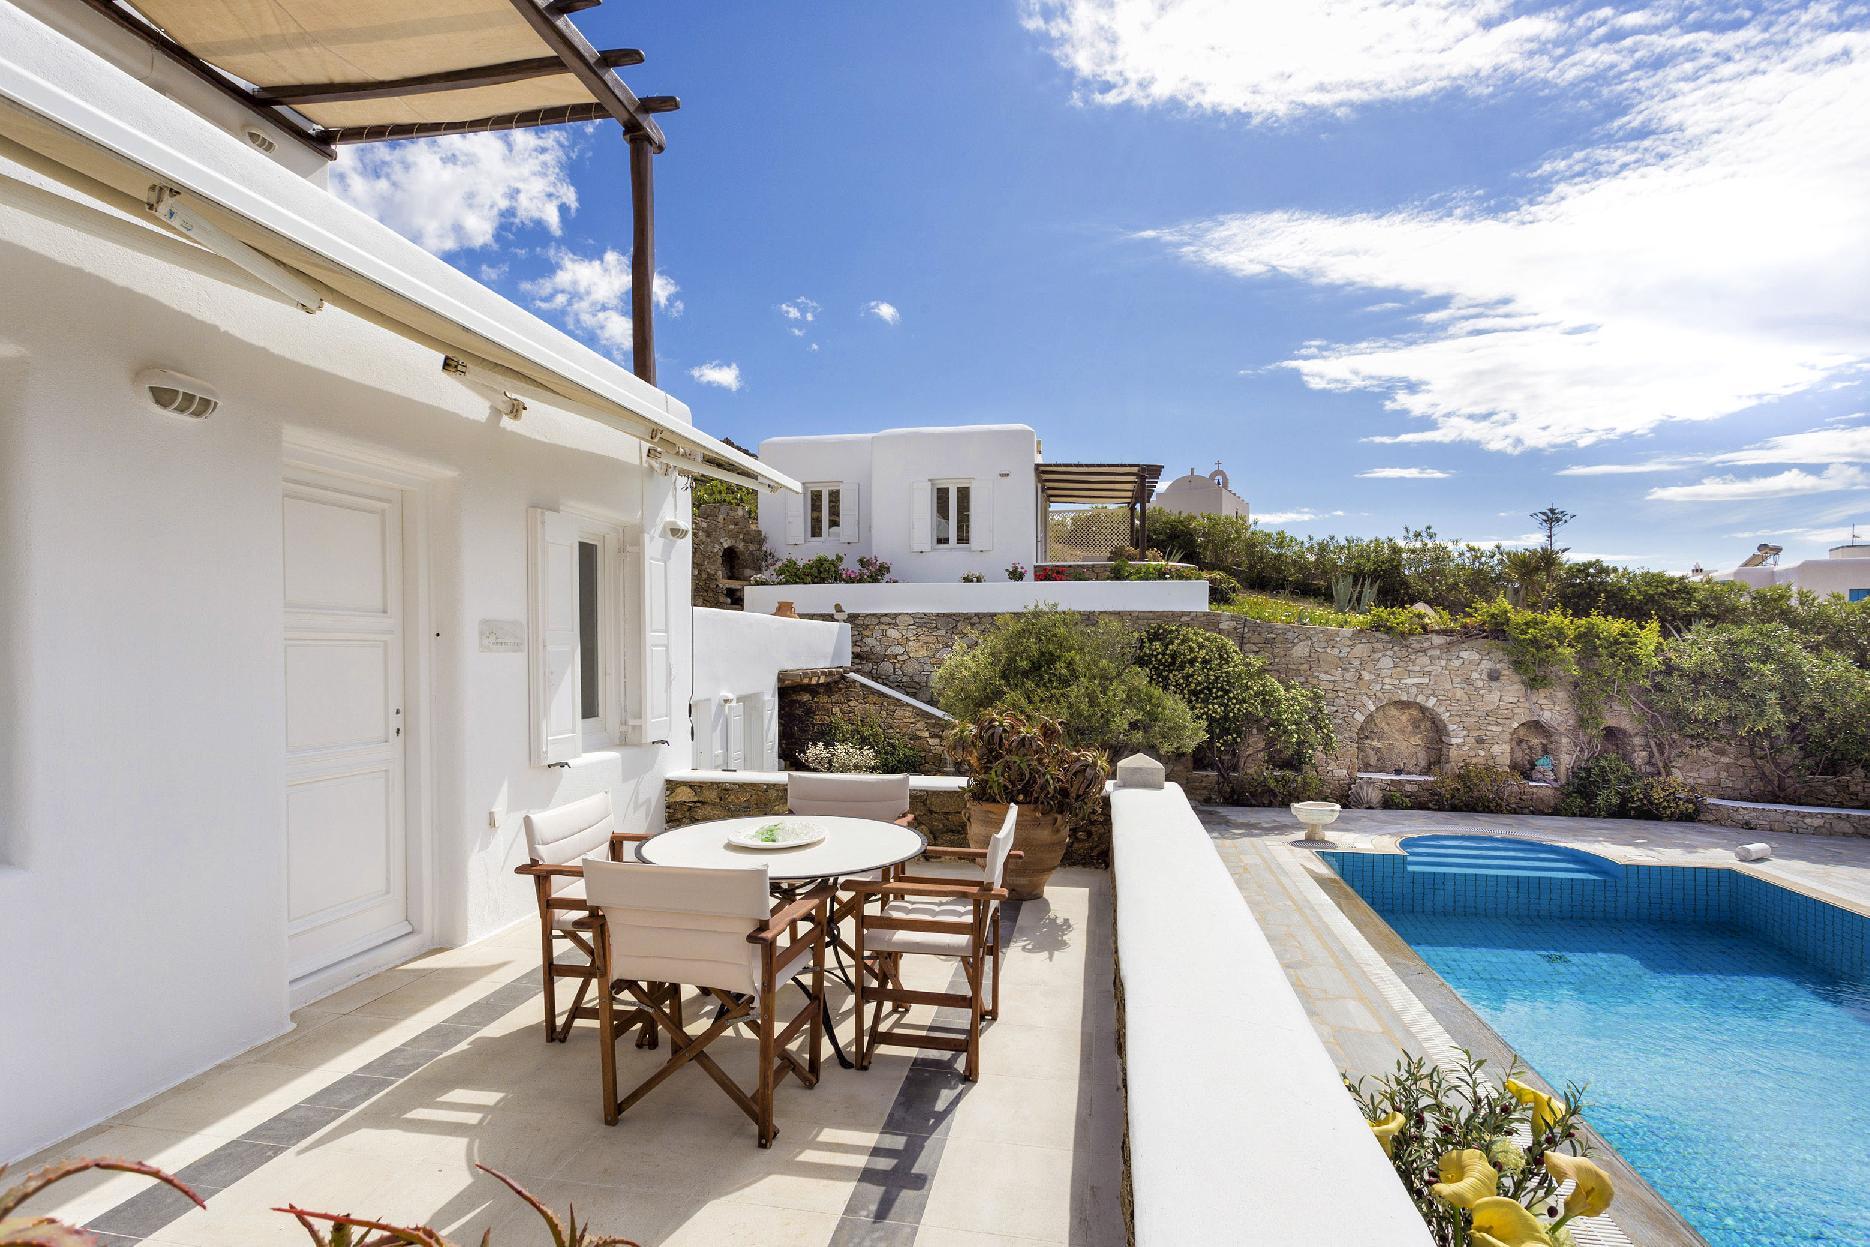 Apartment HOUSE OF THE SUN The Galaxy Mykonos villa photo 1411922